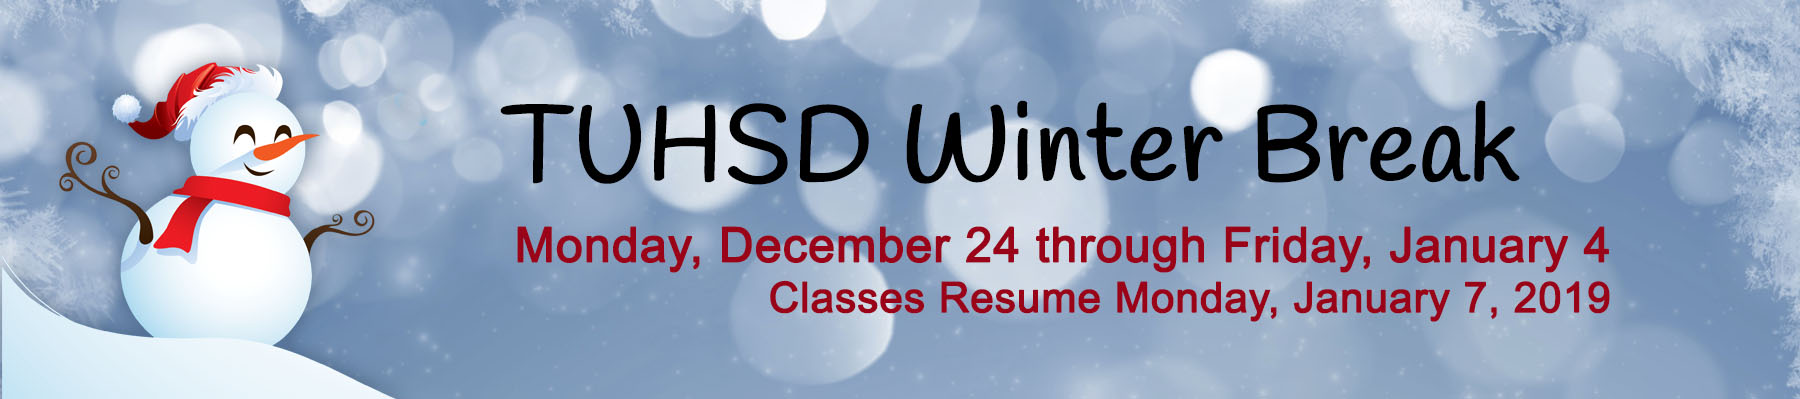 TUSHD Winter Break Monday, December 24 through Friday, January 4 - Classes Resume Monday, January 7, 2019